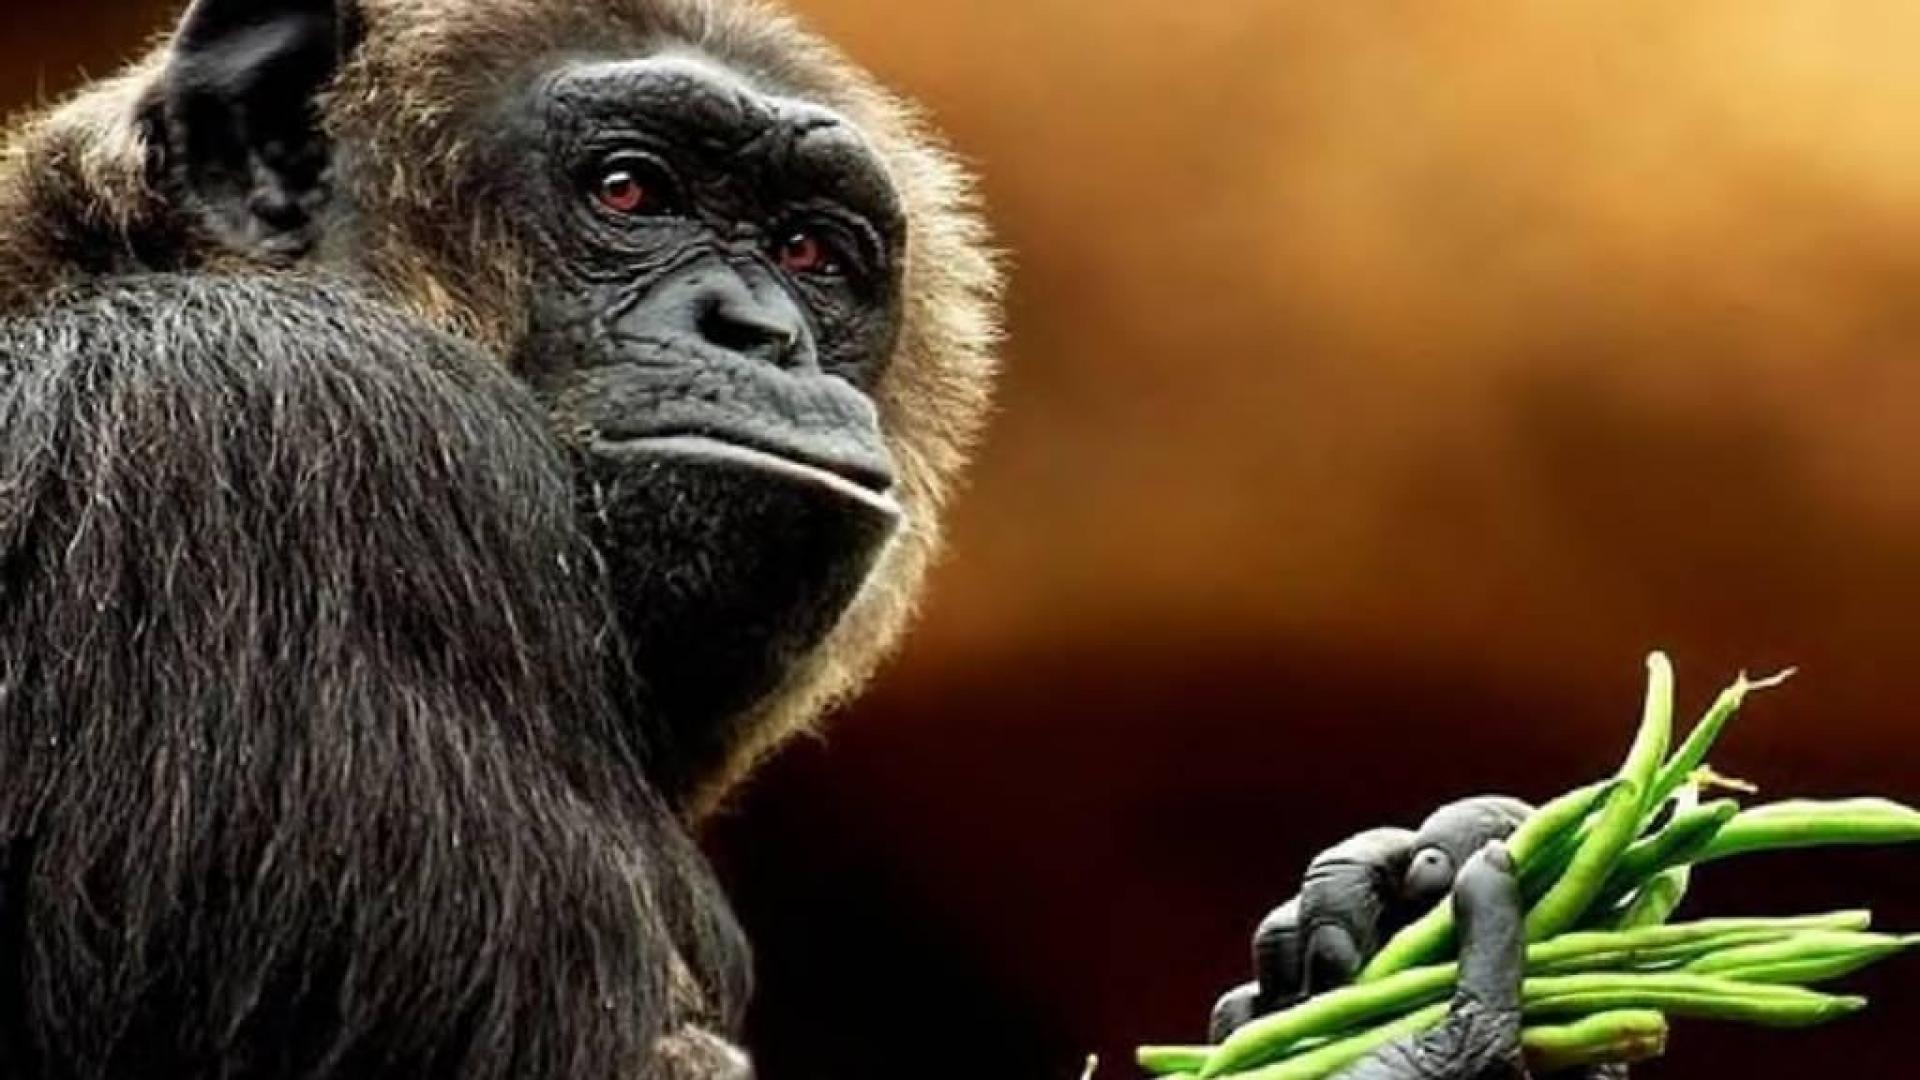 Download Animal Photos, Best Friend, High Resolution, Desktop Images, Animal  Background Images